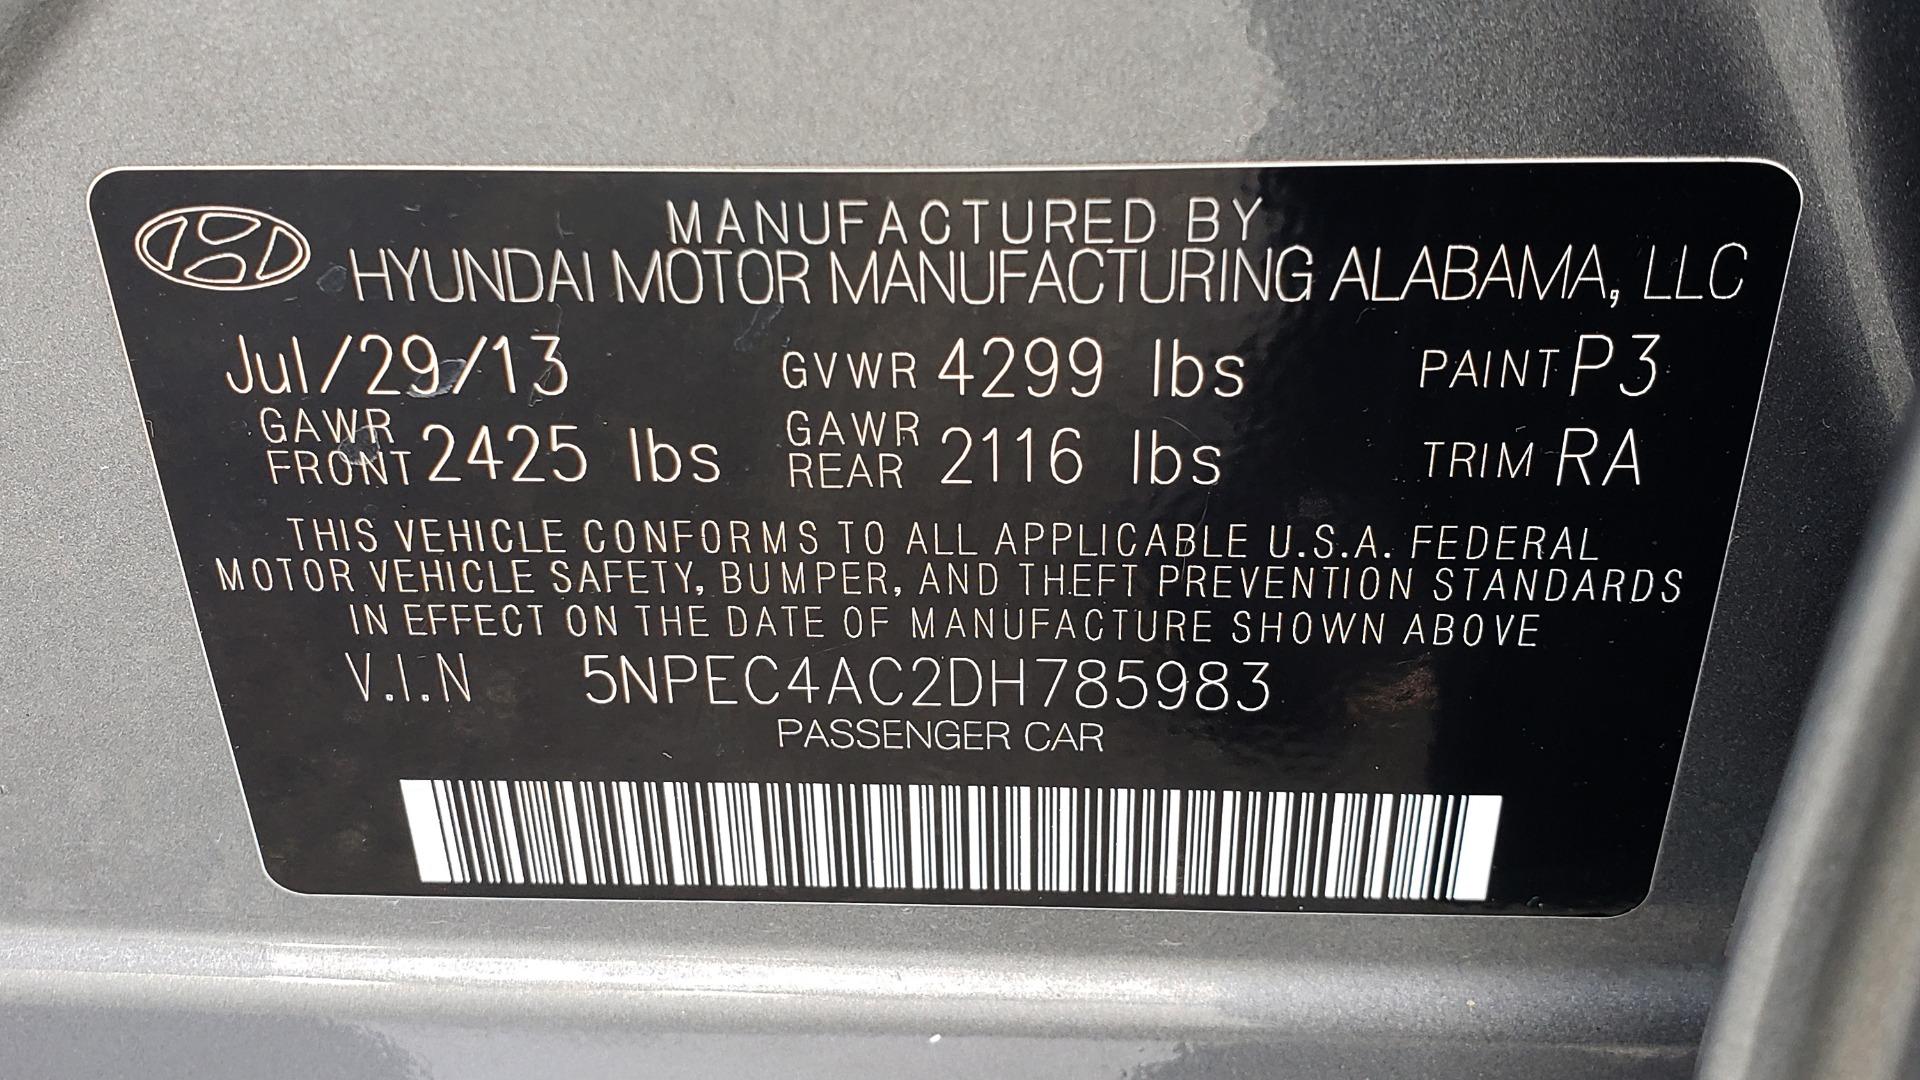 Used 2013 Hyundai SONATA SE AUTO / 2.4L 4-CYL / 6-SPD AUTO / VERY CLEAN for sale Sold at Formula Imports in Charlotte NC 28227 79